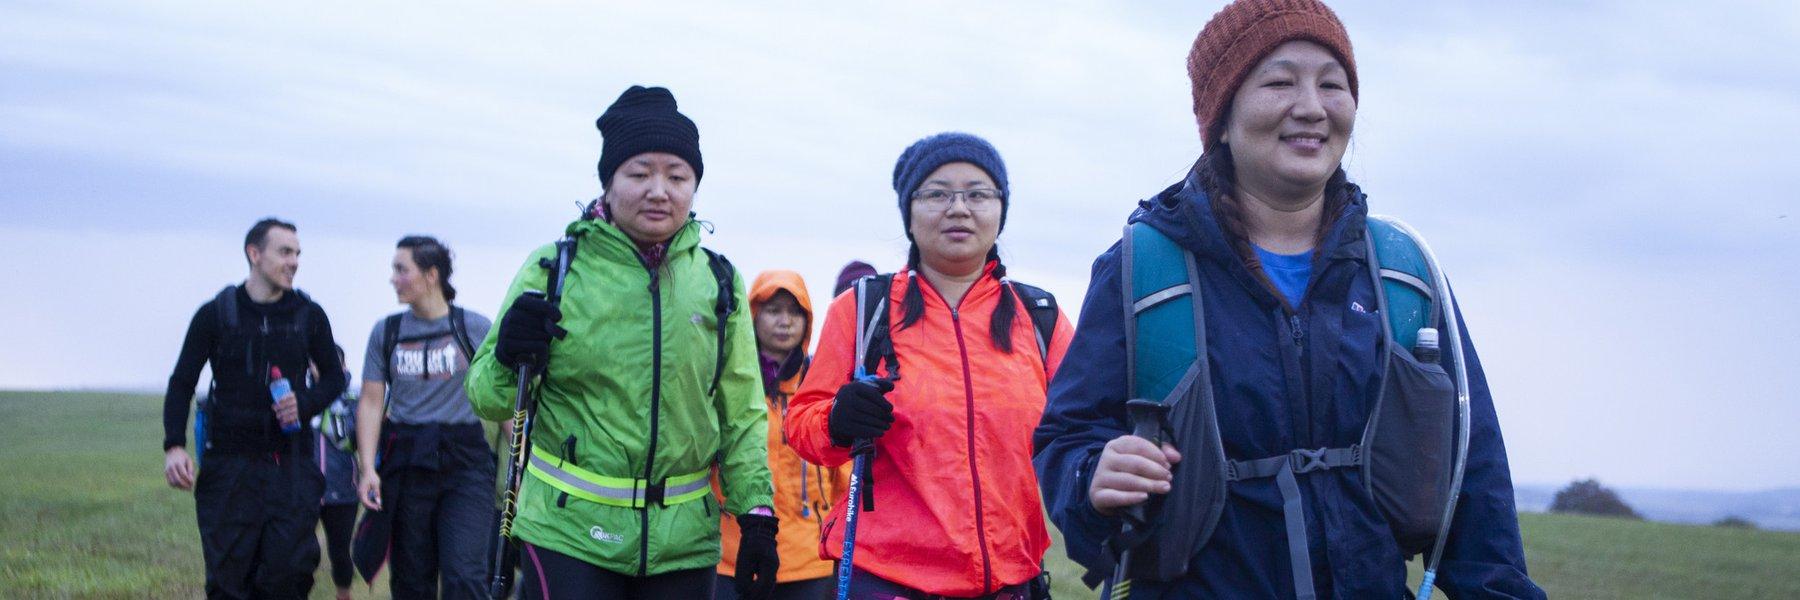 Participants at Trailwalker